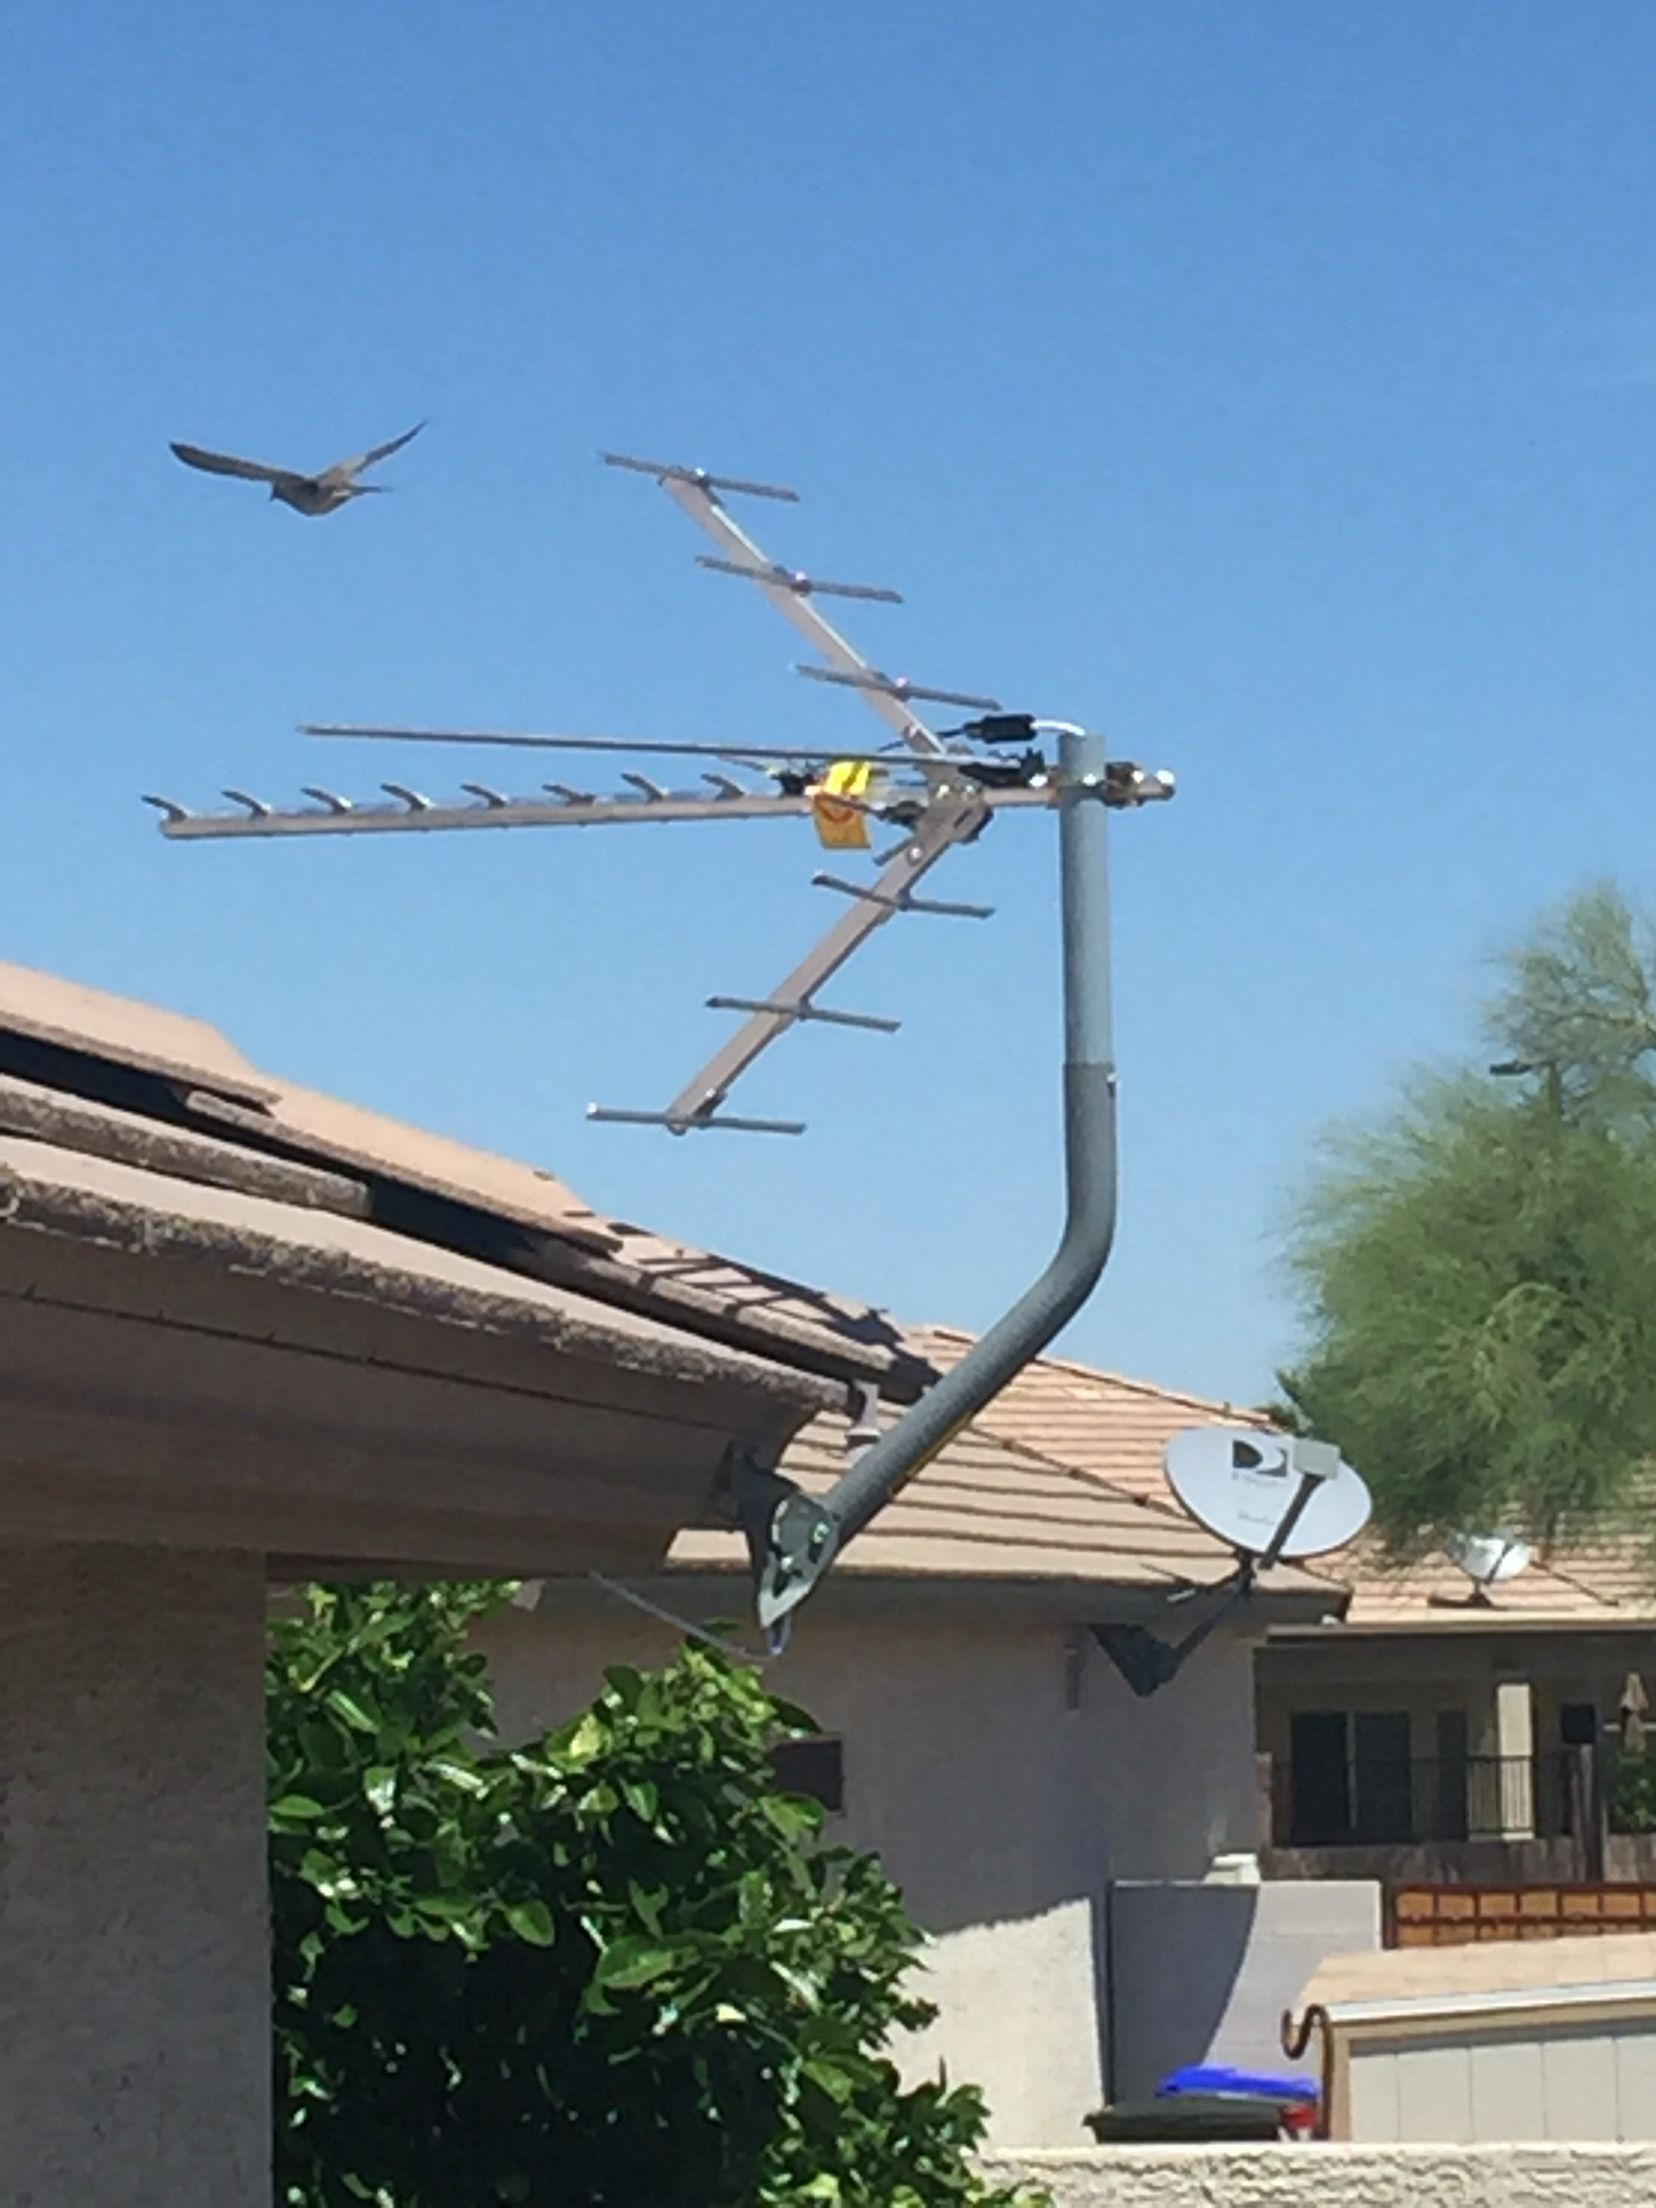 Superior Outdoor HDTV Antenna Installation With A DVR+ In Chandler, AZ. Record  Antenna TV For